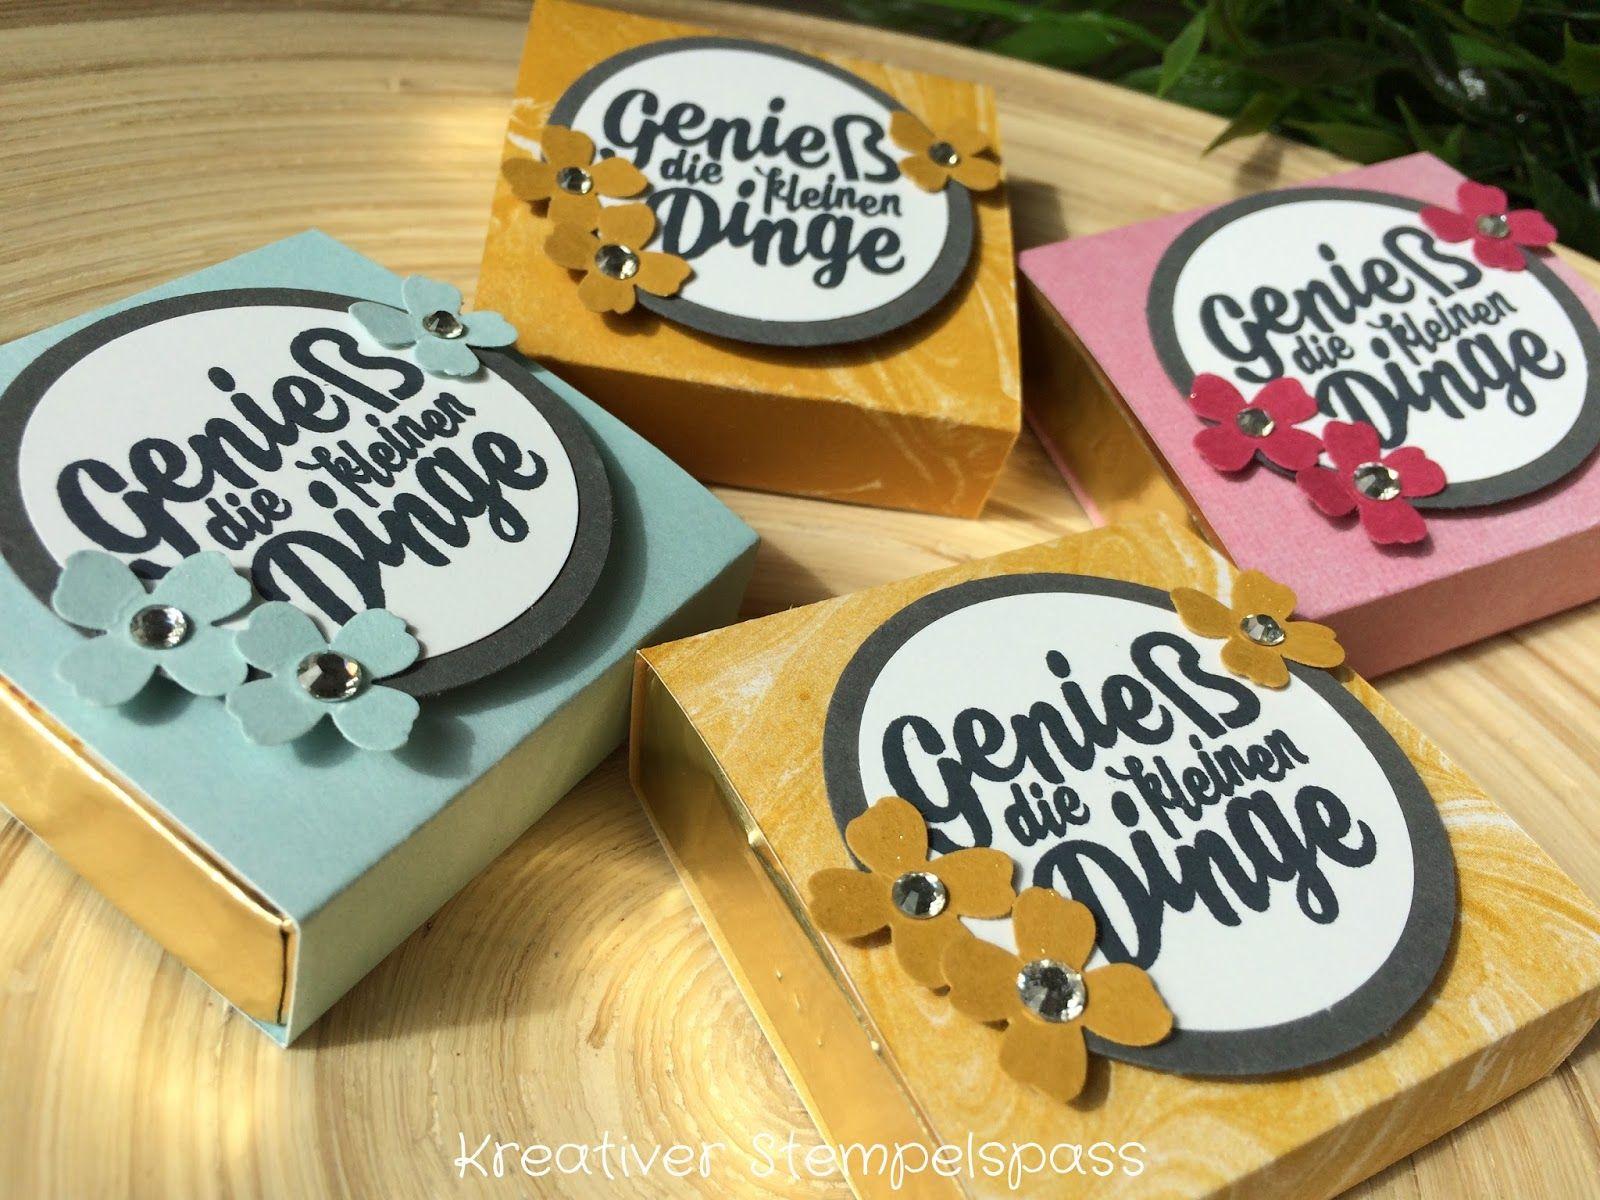 Kreativer Stempelspaß: Goodies